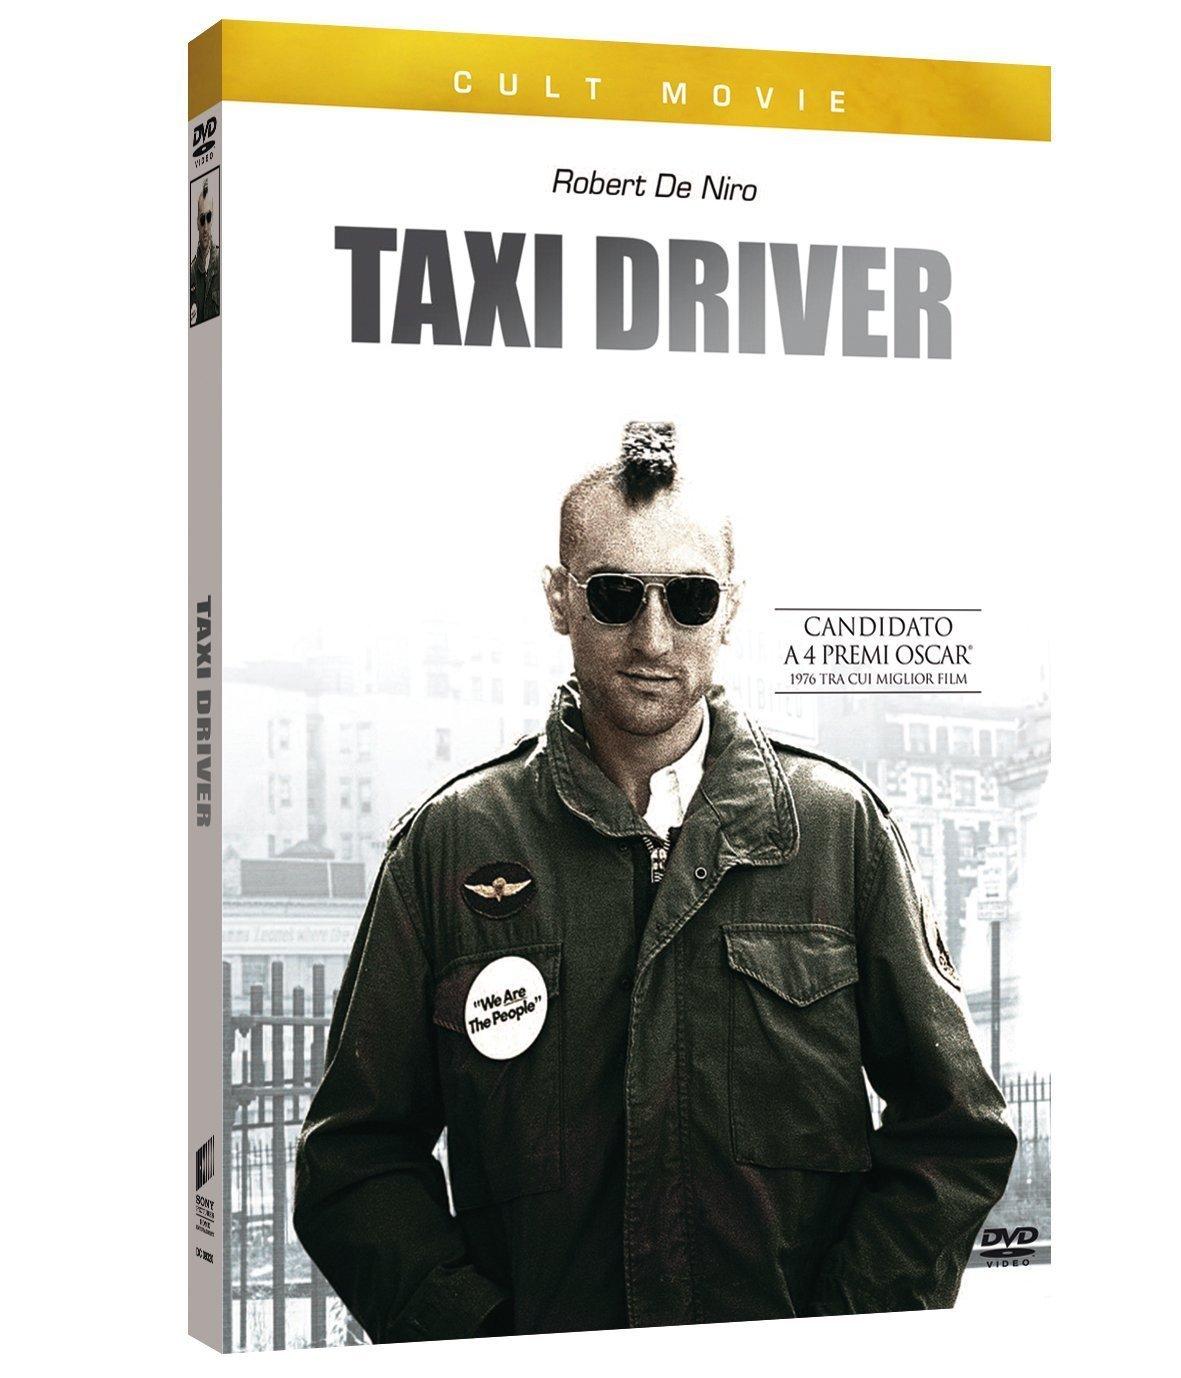 Taxi driver (collector's edition) [IT Import]: Amazon.de: Robert De Niro,  Jodie Foster, Peter Boyle, Albert Brooks, Cybill Shepherd, Martin Scorsese,  Robert De Niro, Jodie Foster: DVD & Blu-ray